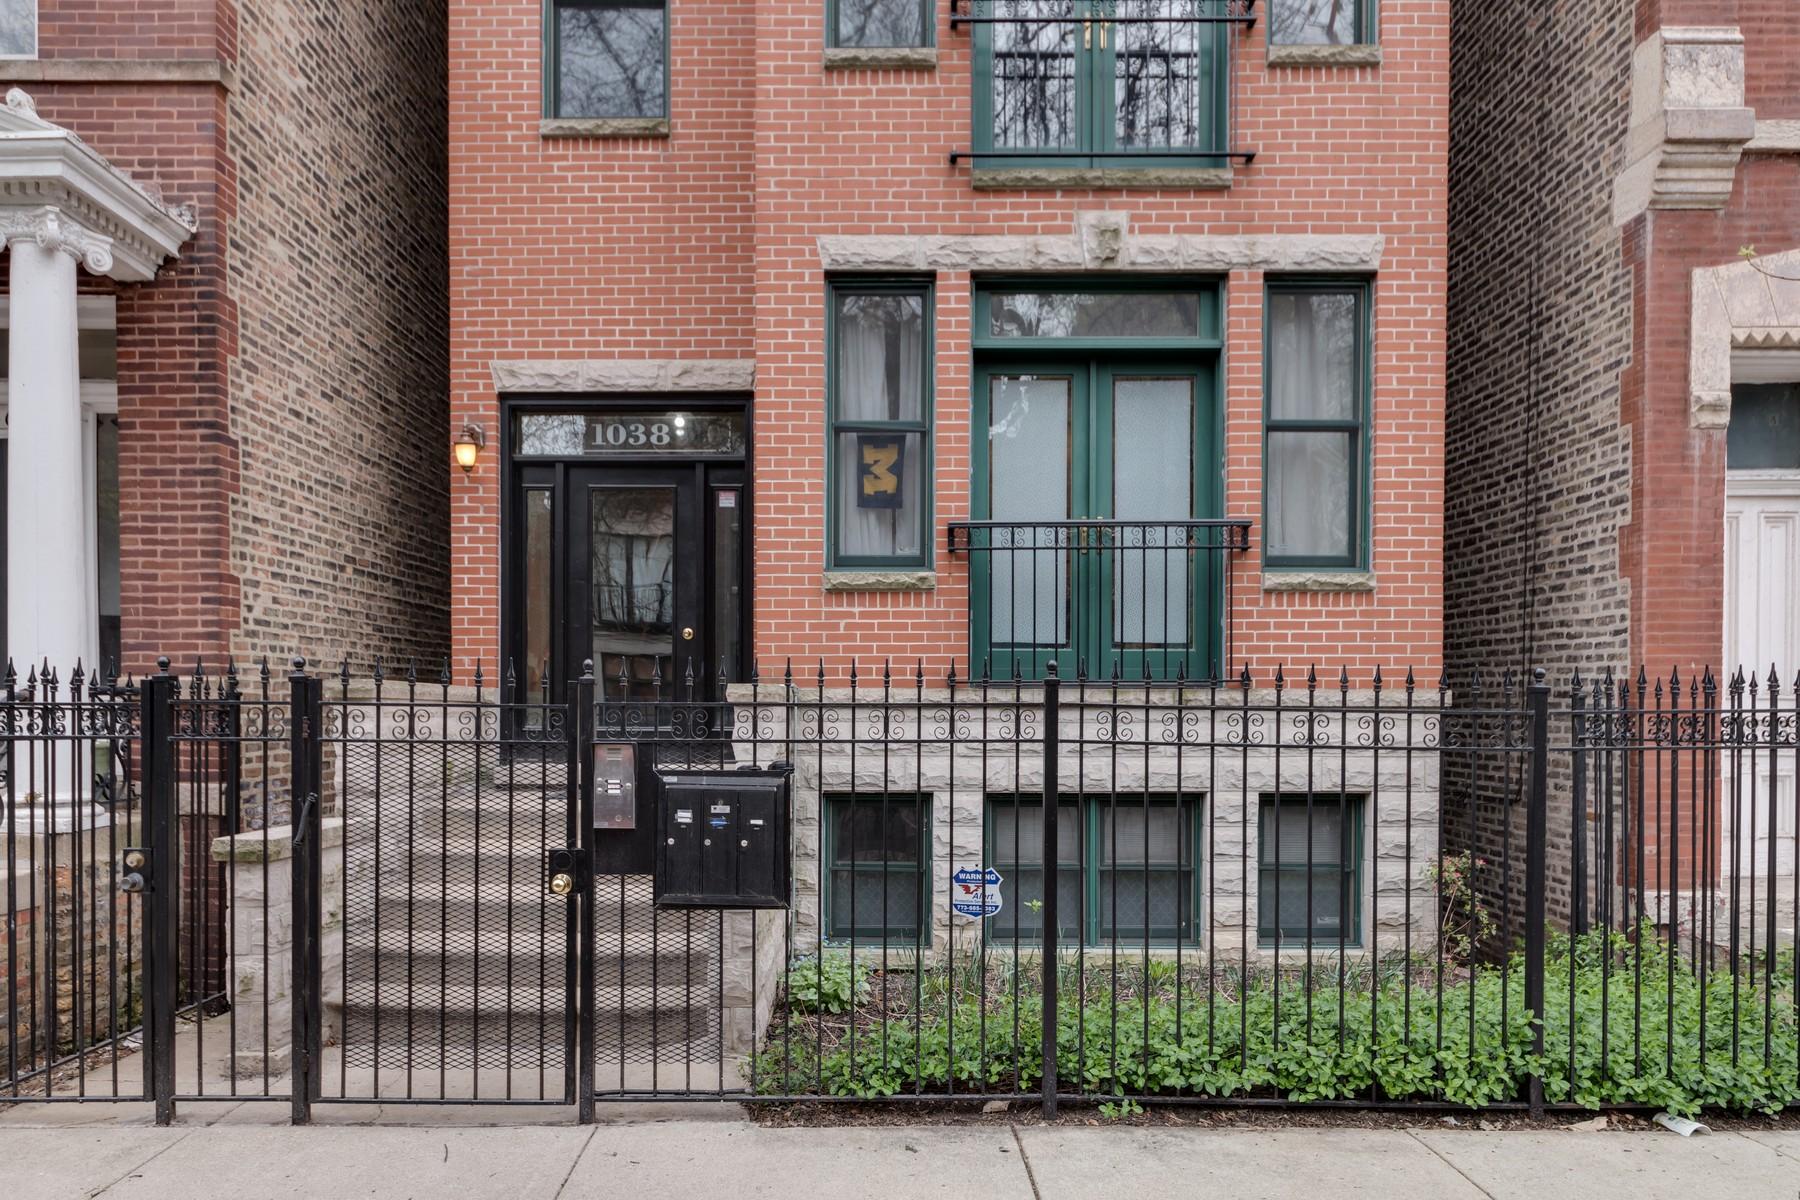 Condominio por un Venta en Take Advantage of the Views from this Penthouse Duplex 1038 N. Marshfield Avenue, Unit 3 Chicago, Illinois, 60622 Estados Unidos